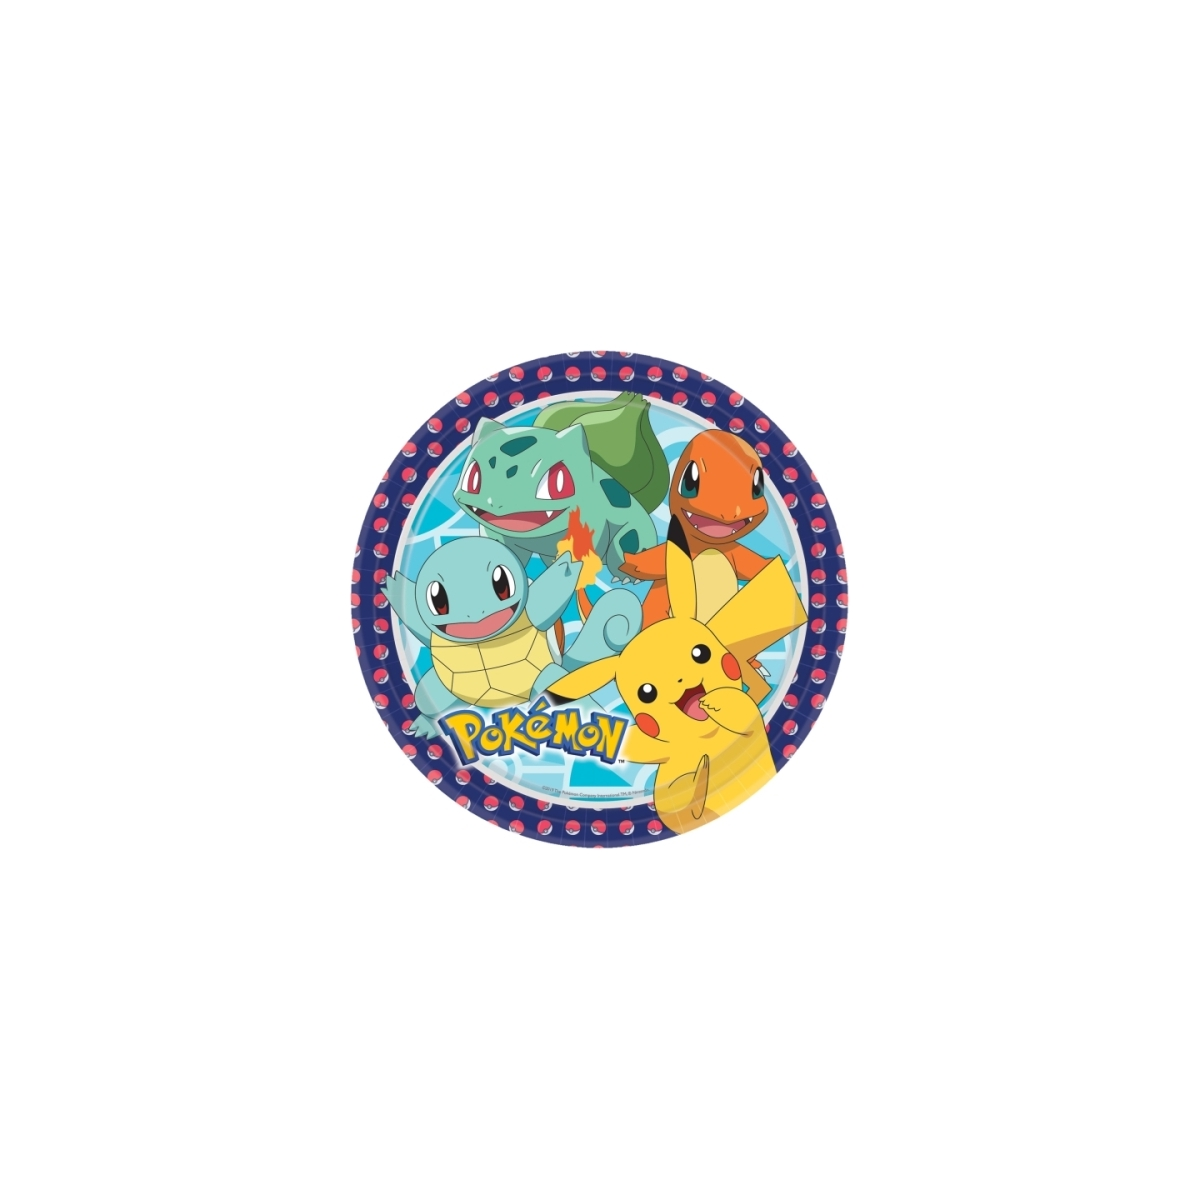 Irpot Kit n.49 Coordinato Tavola Pokemon Addobbi Festa